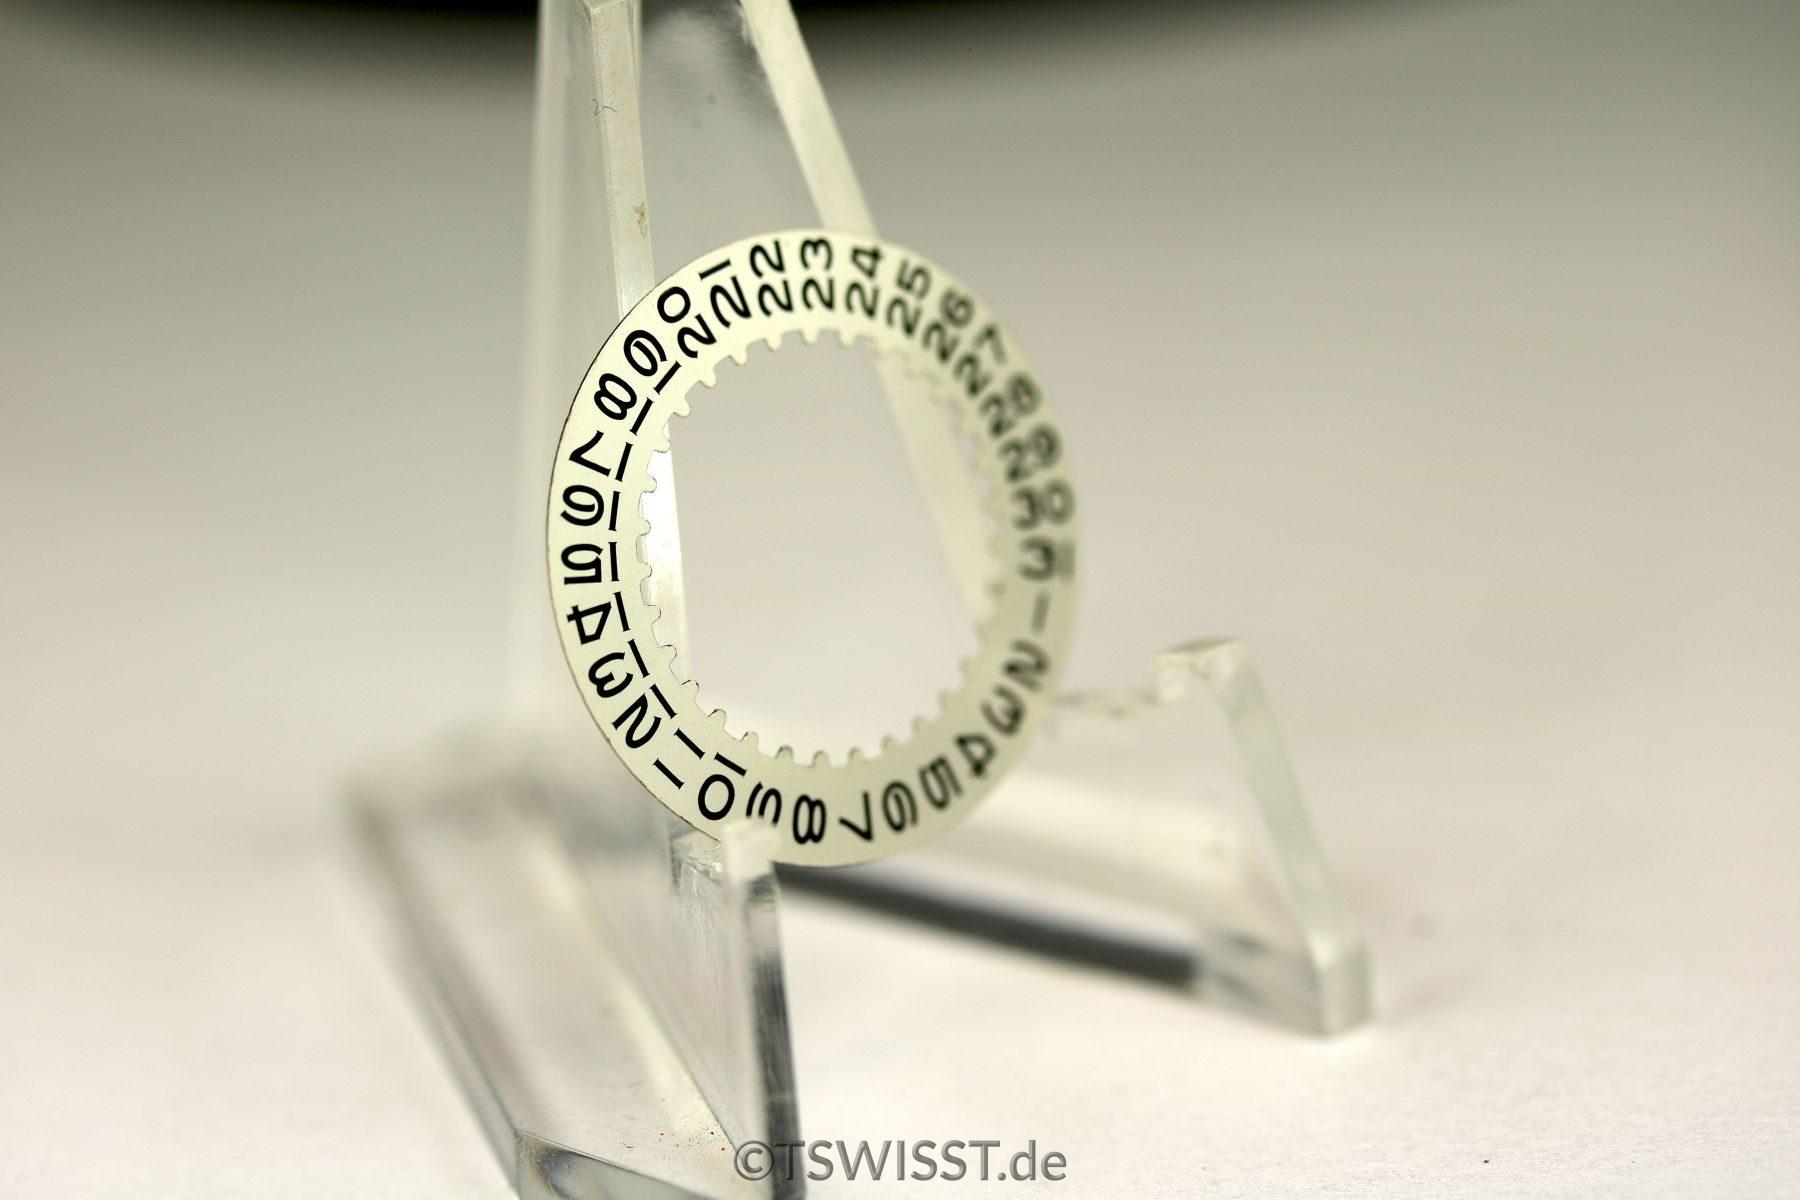 Rolex date wheel